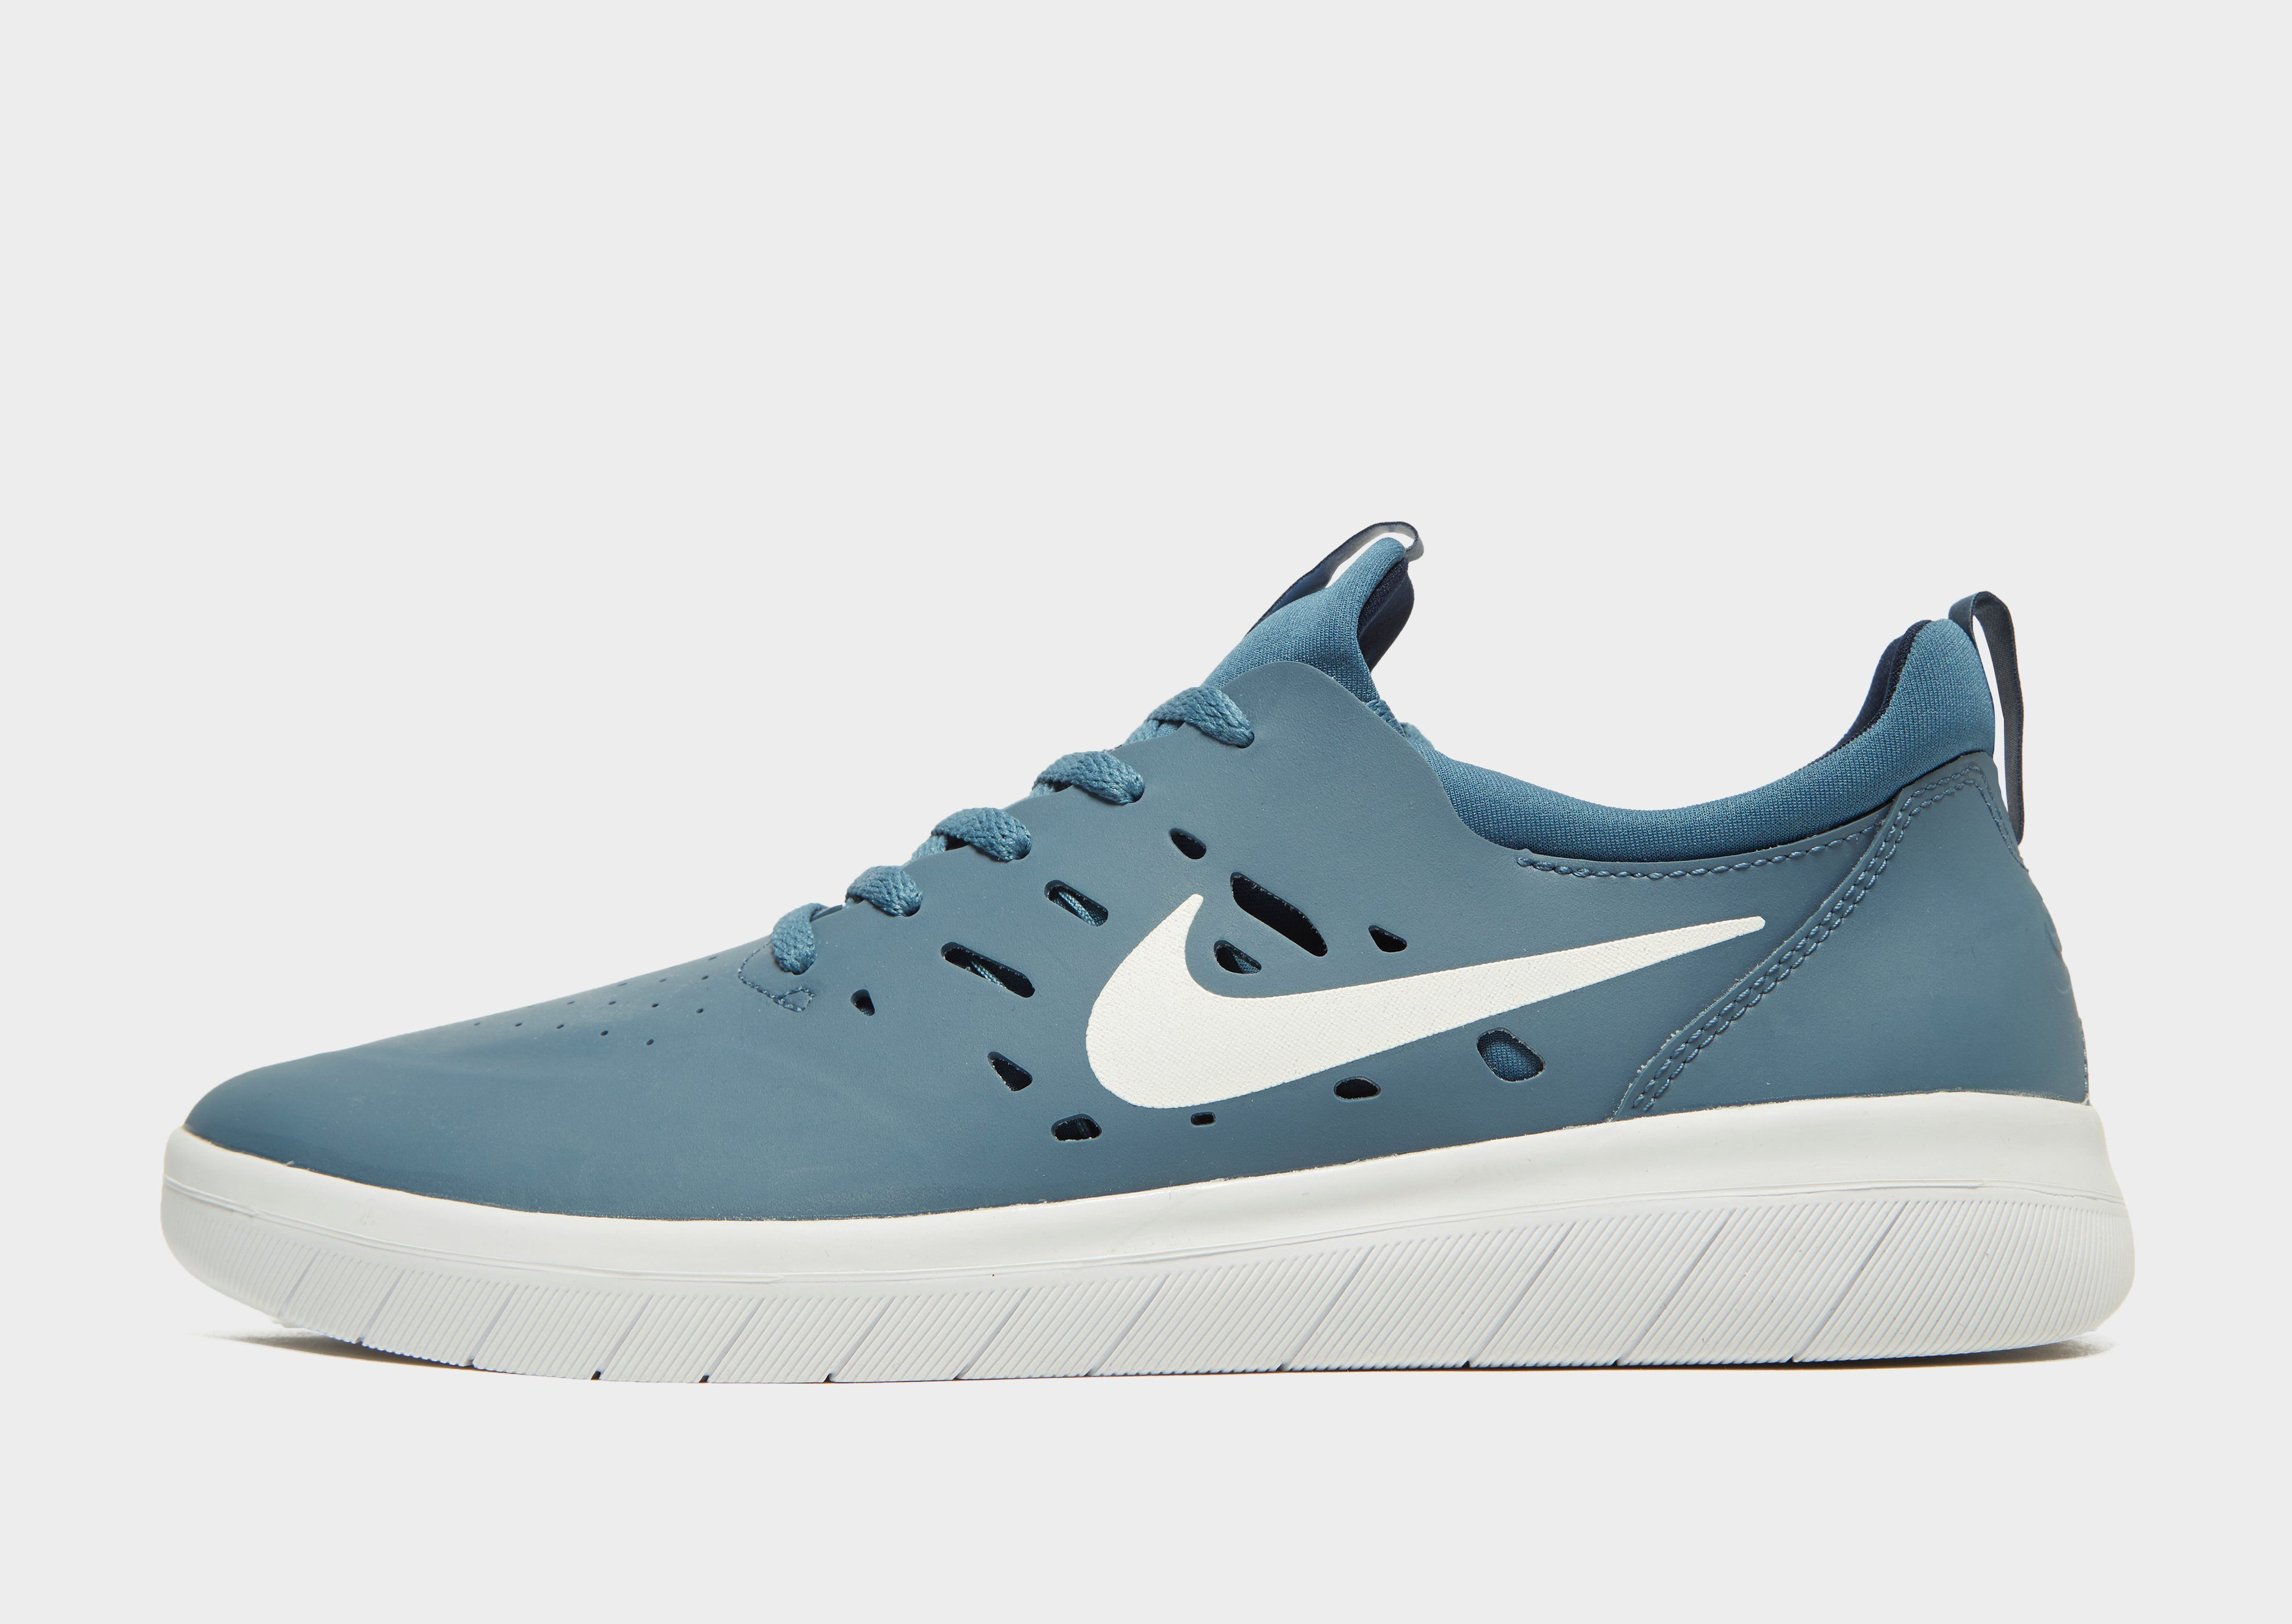 f5fa4ddd5e98 Nike SB Nyjah Free